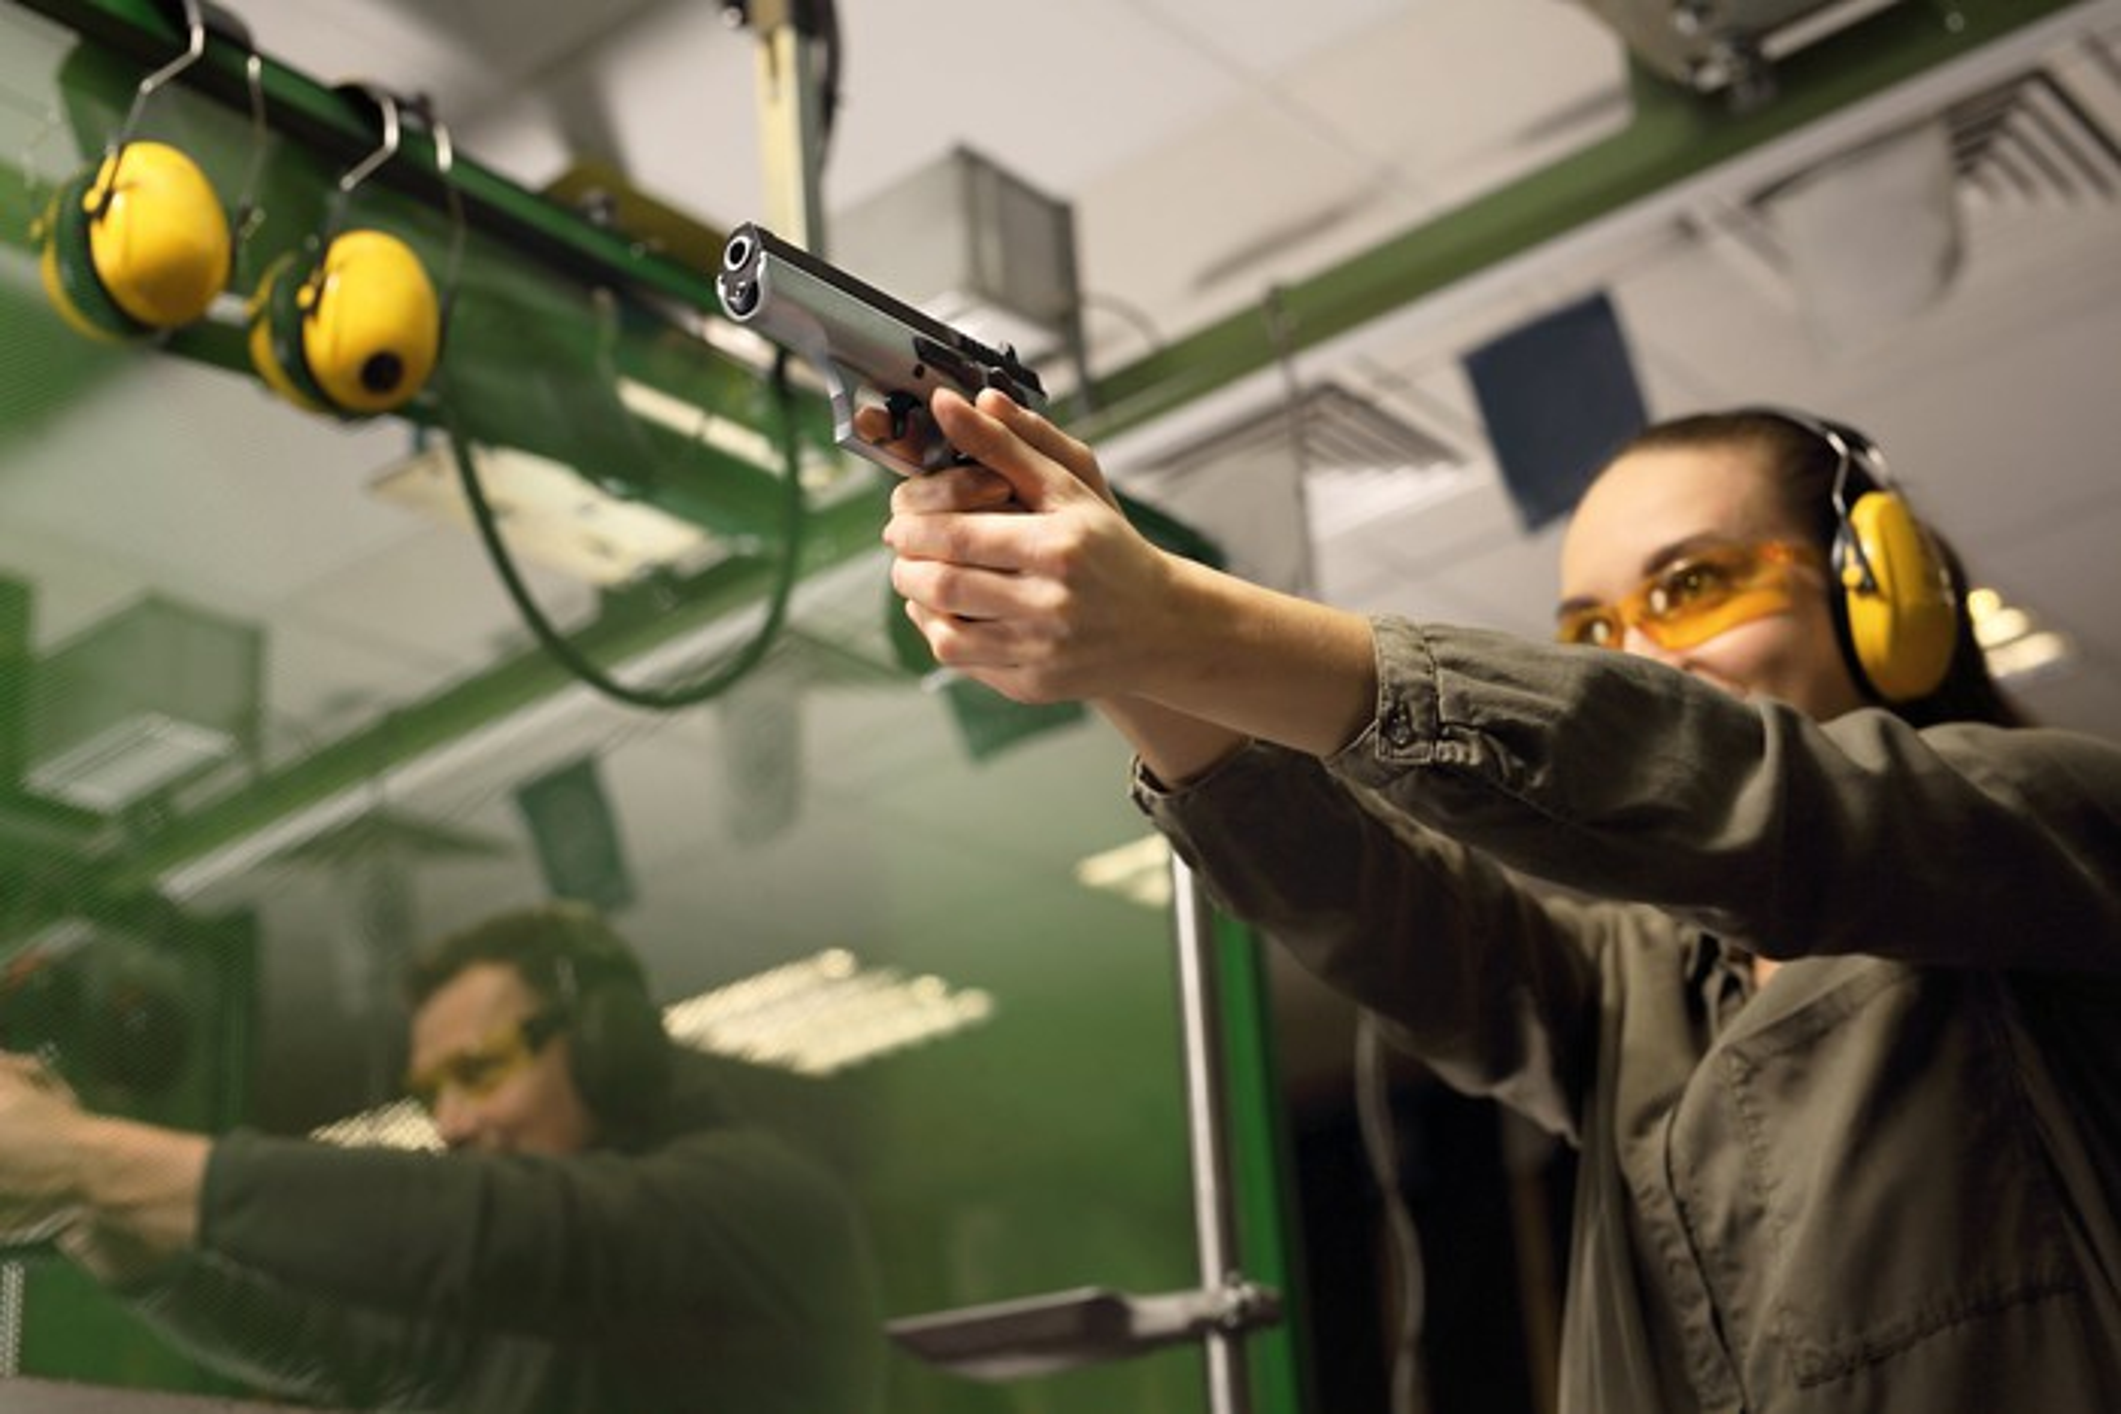 Woman firing pistol at gun range